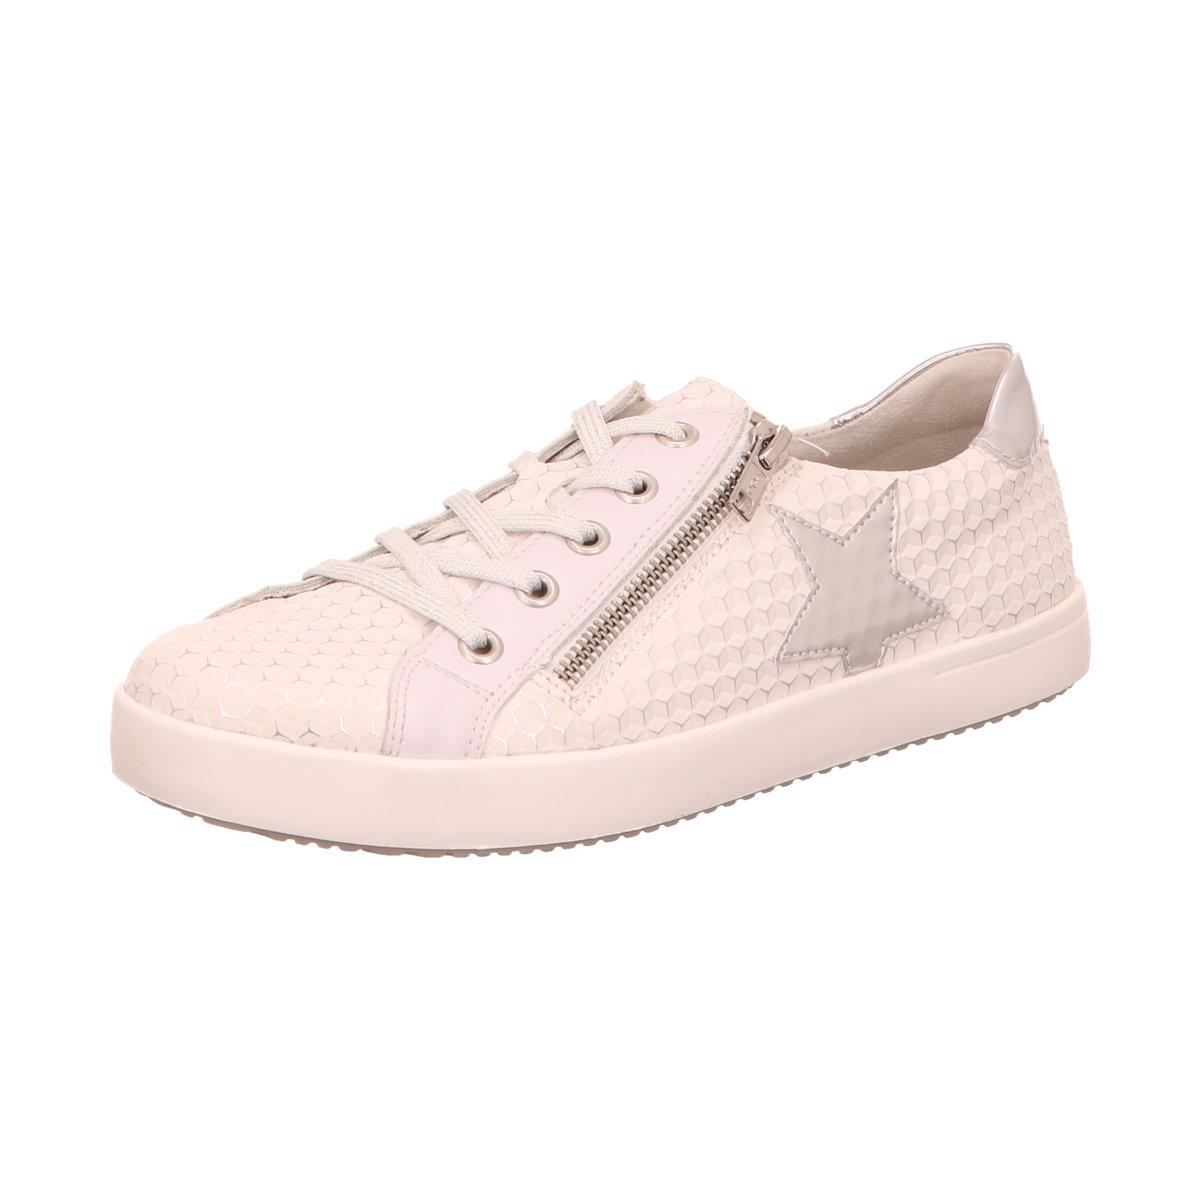 20a0c19ed11 Nike Kobe XI XI XI 11 TB Promo Purple Basketball Shoes 856485-551 Size 18  Big and Tall 1a9ed7